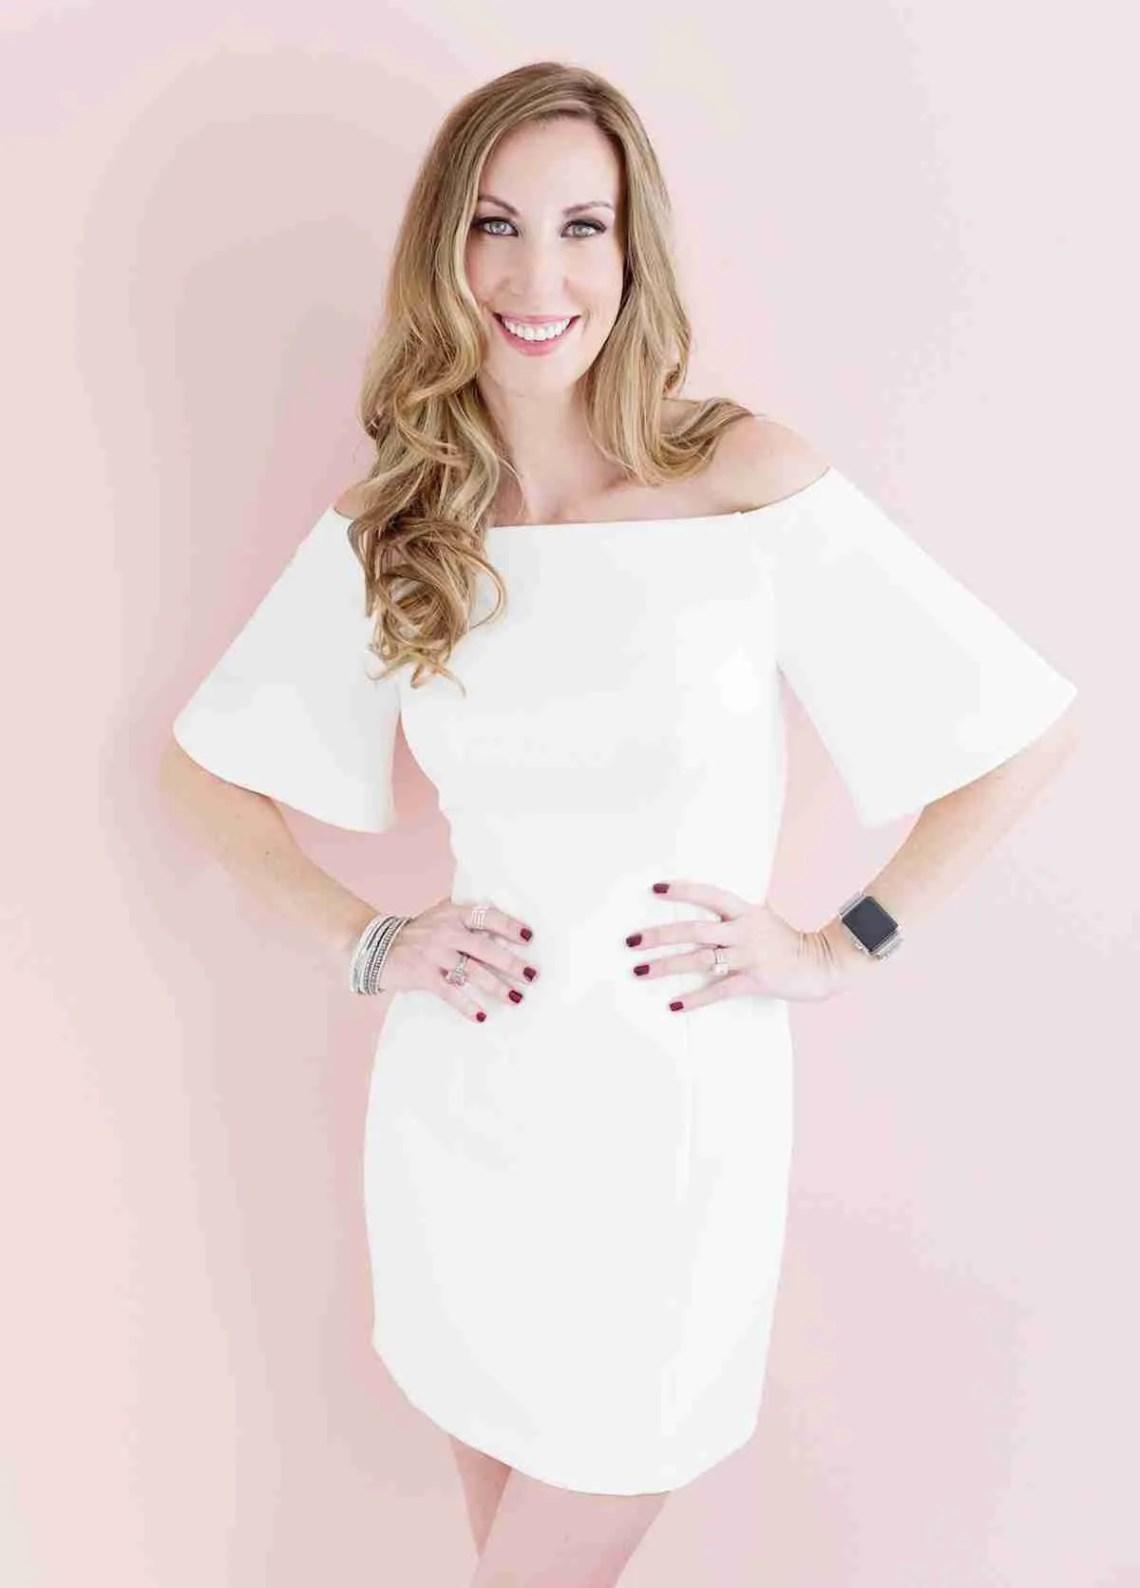 Jen Percival Real Estate Coach